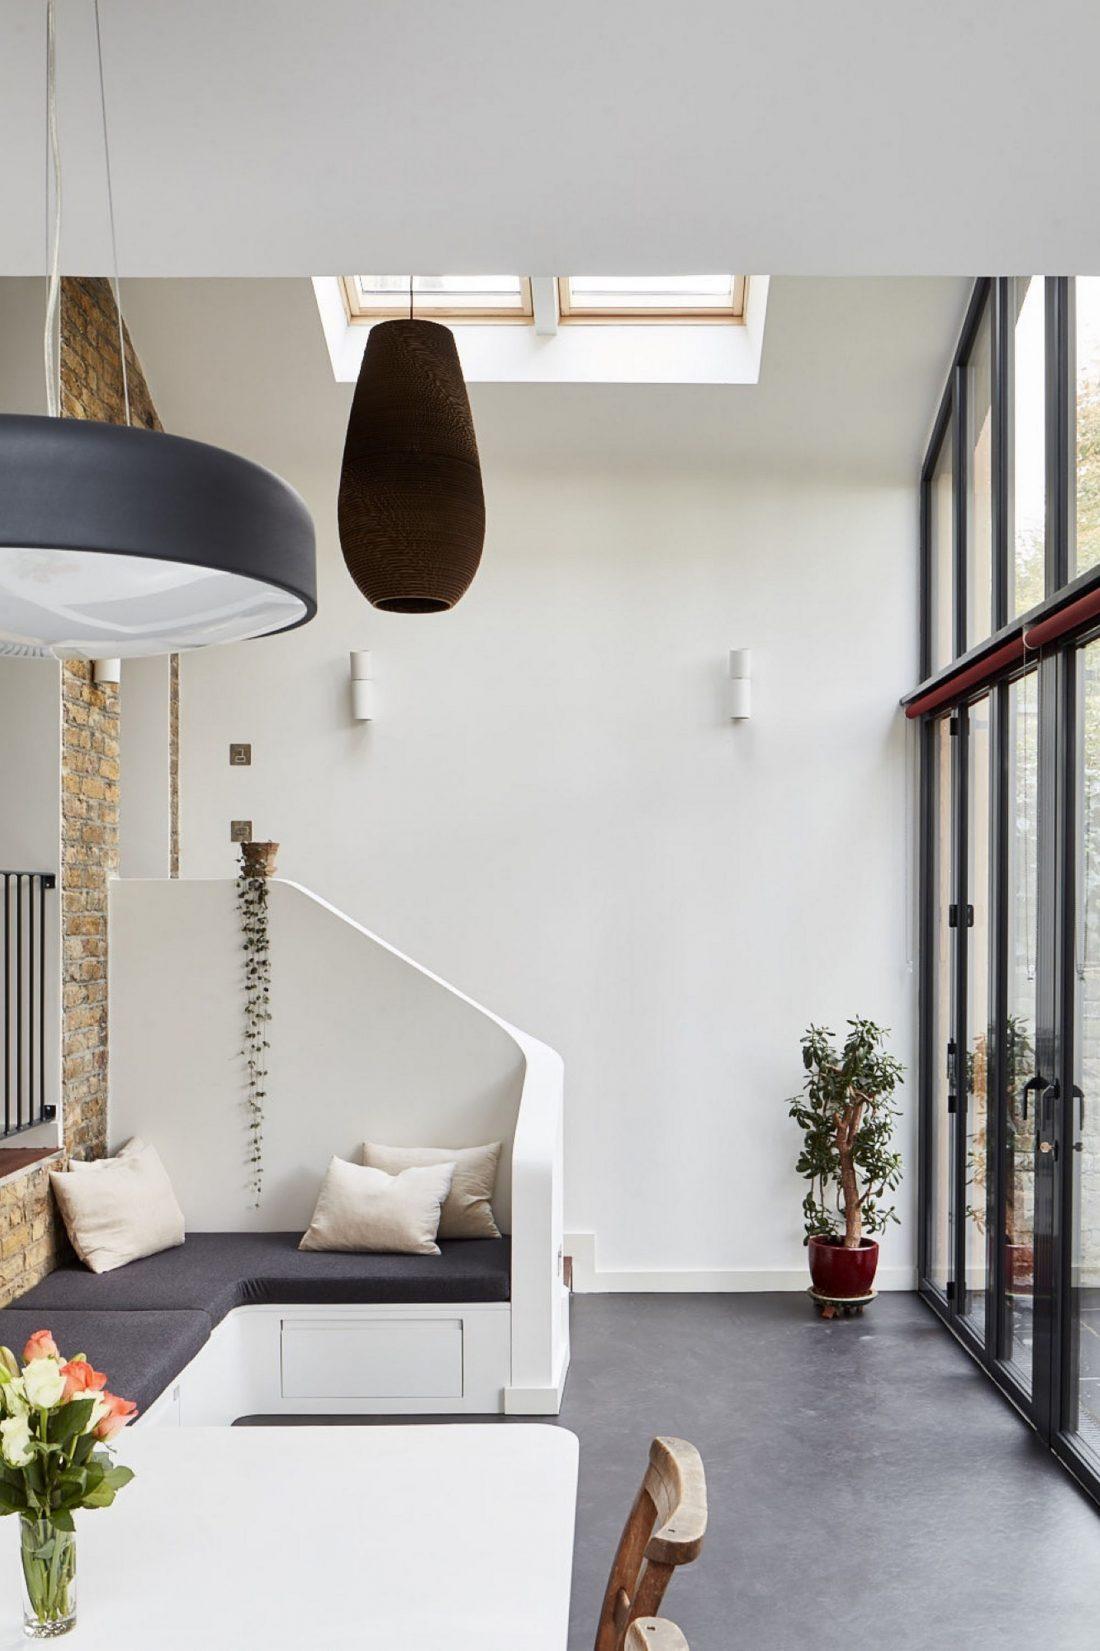 preobrazovanie-viktorianskoj-villy-v-londone-ot-scenario-architecture-17